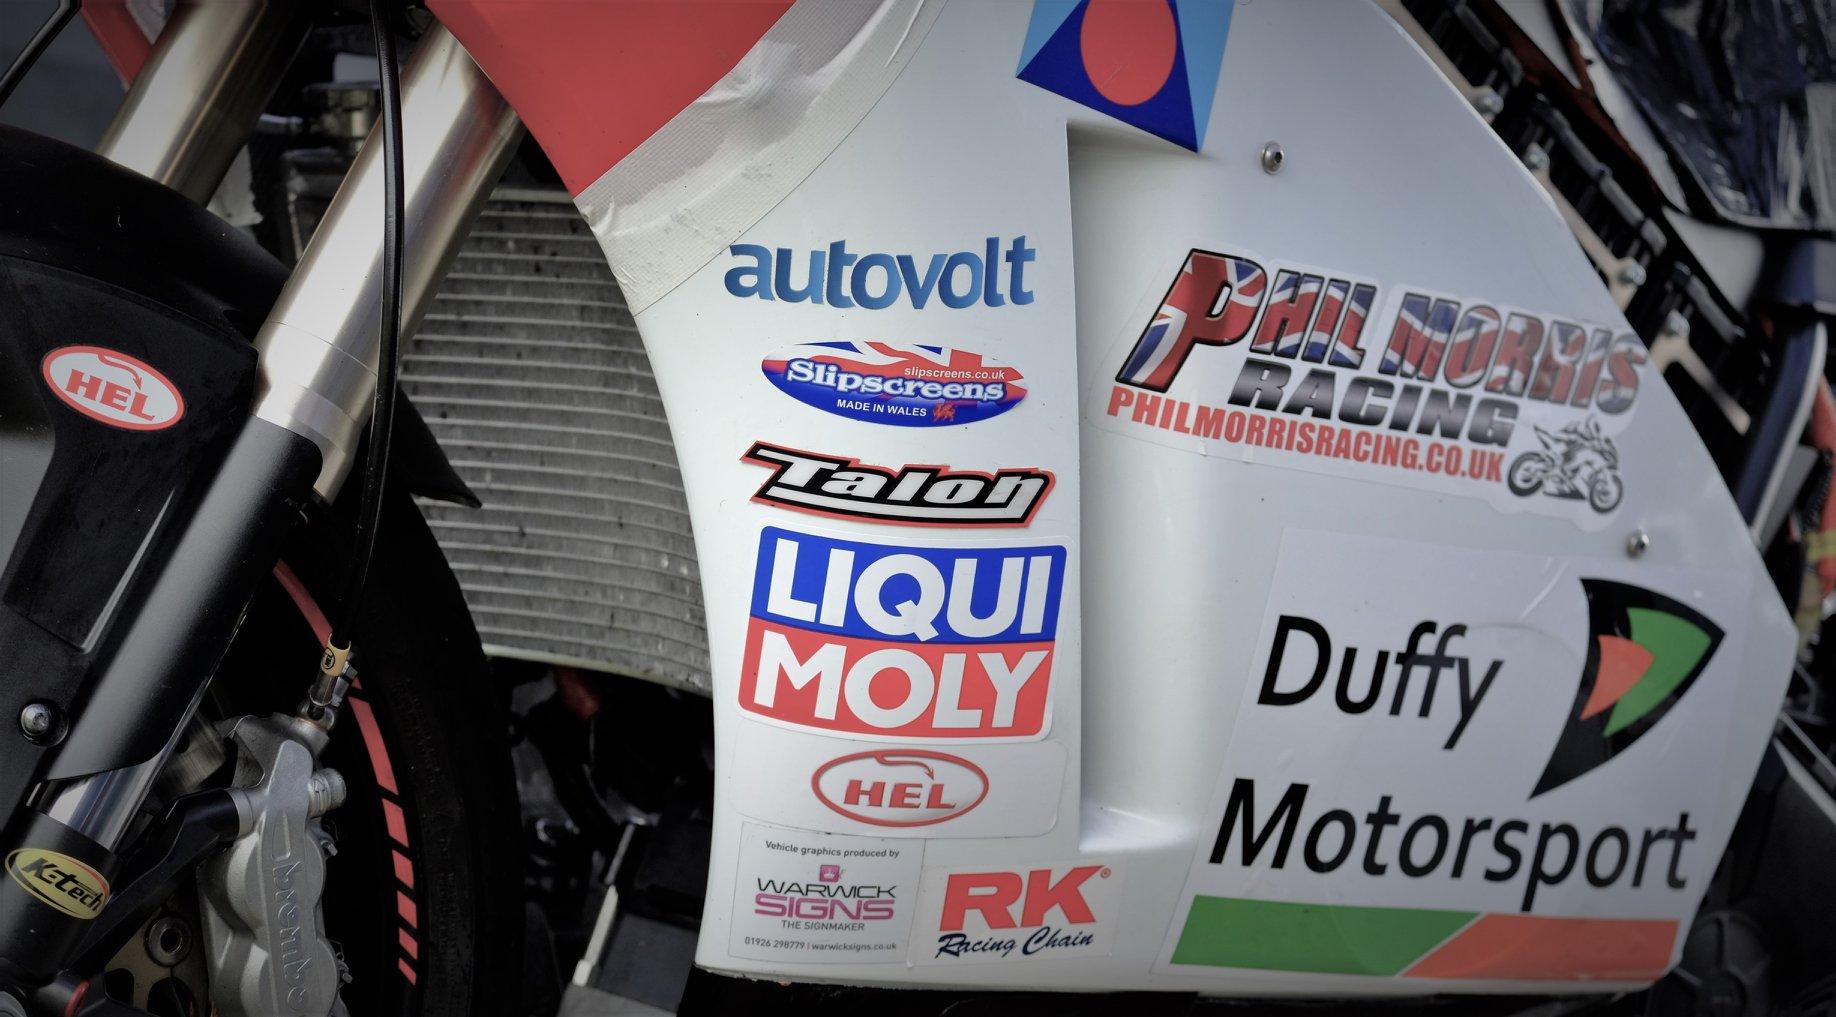 Duffy Motorsport Confirm TT 2019 Presence